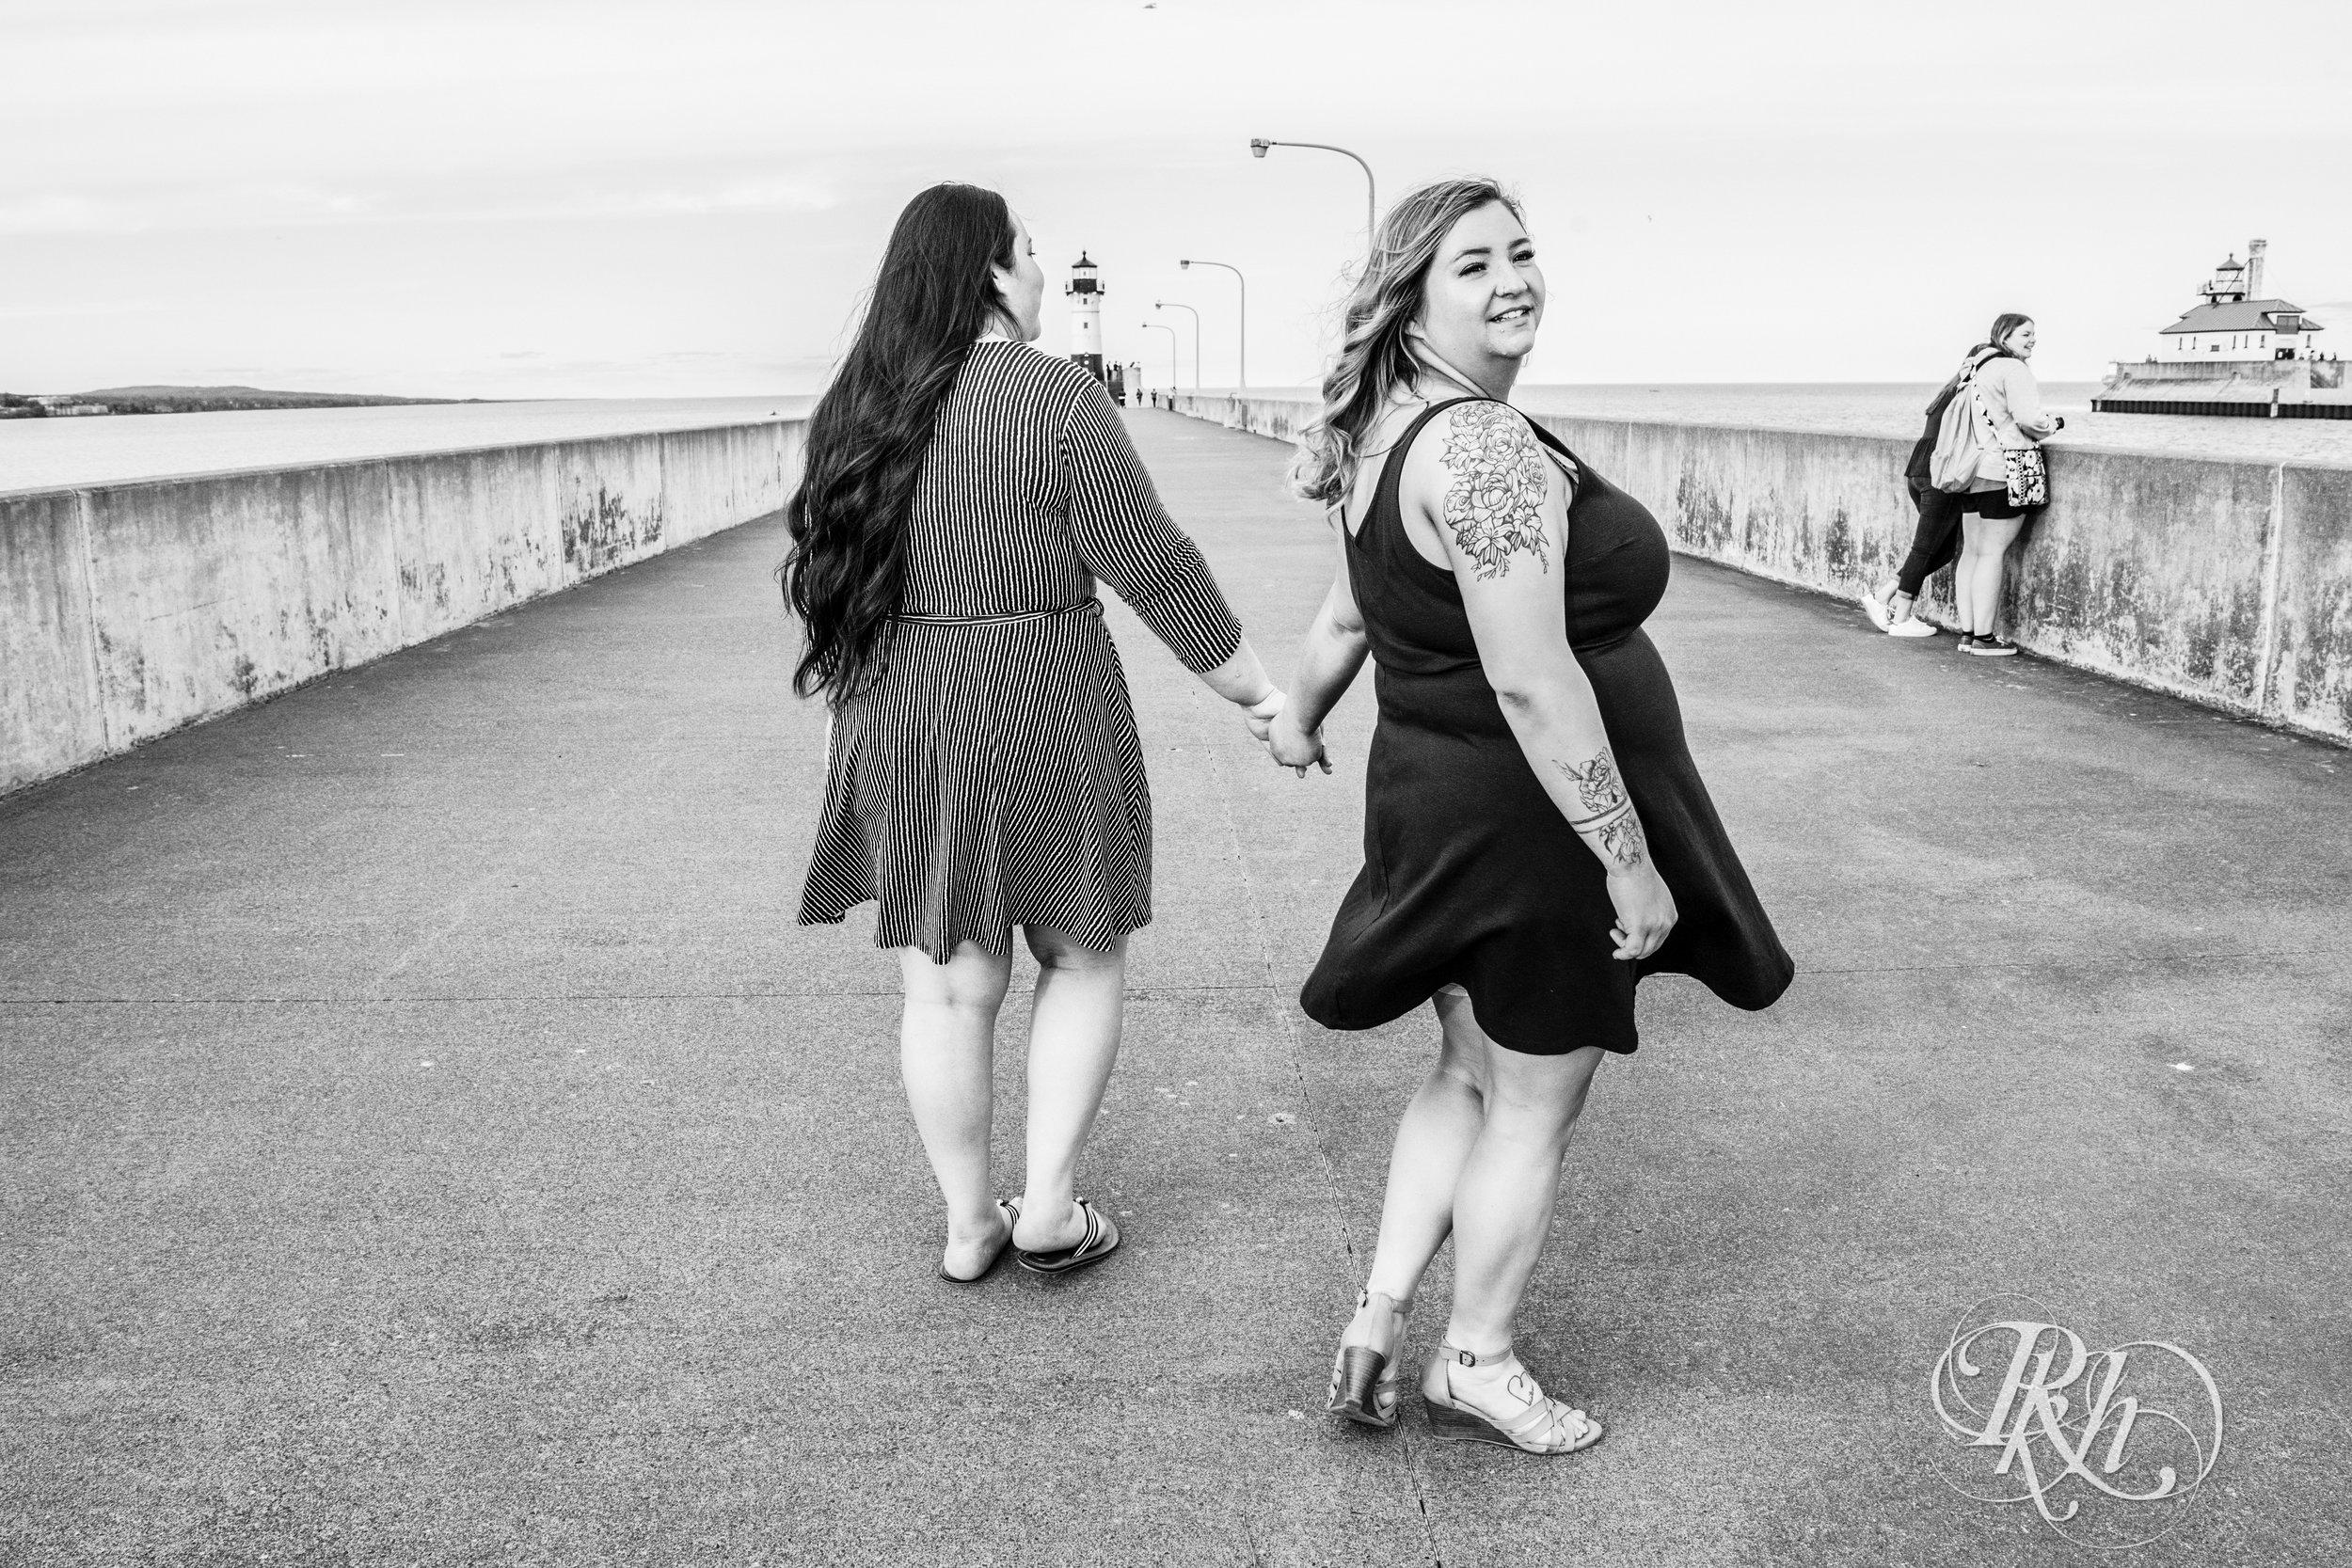 Rose and Yesenia - Minnesota Engagement Photography - Duluth - RKH Images - Blog (16 of 22).jpg